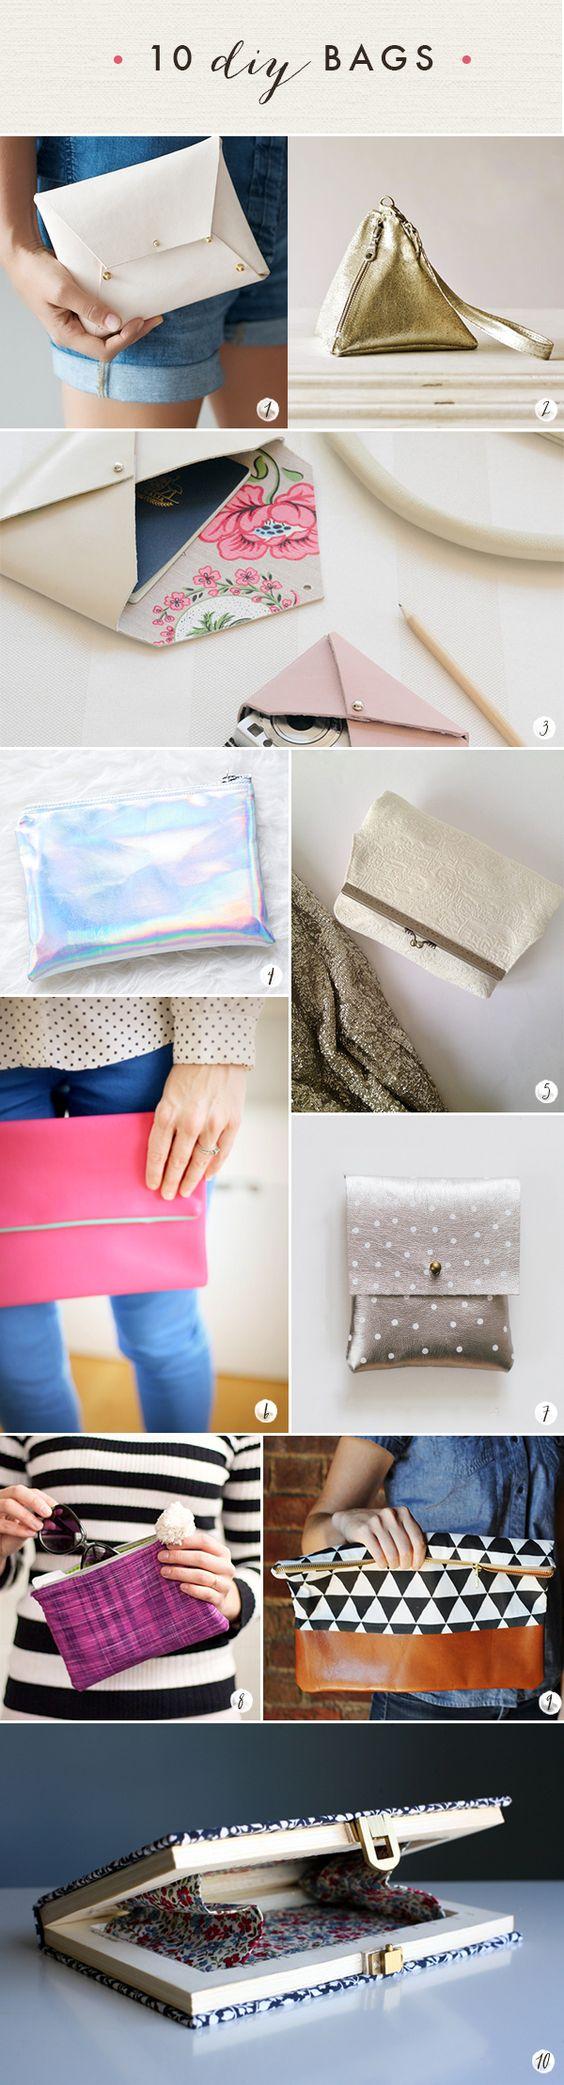 selbstgemachte taschen last minute geschenke and accessoires selbstgemacht on pinterest. Black Bedroom Furniture Sets. Home Design Ideas